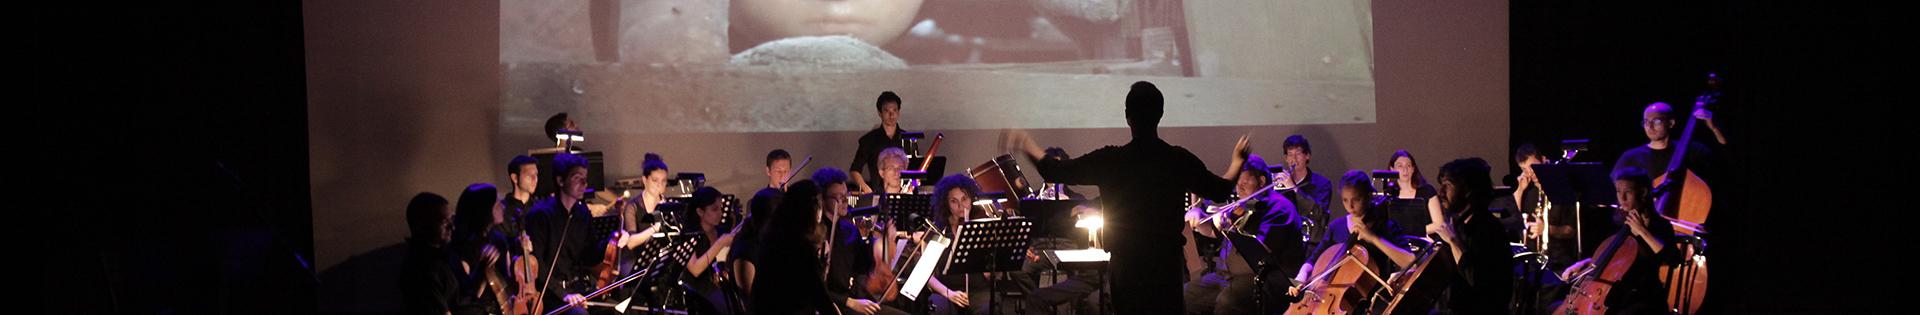 The Revolution Series at the Israeli Opera